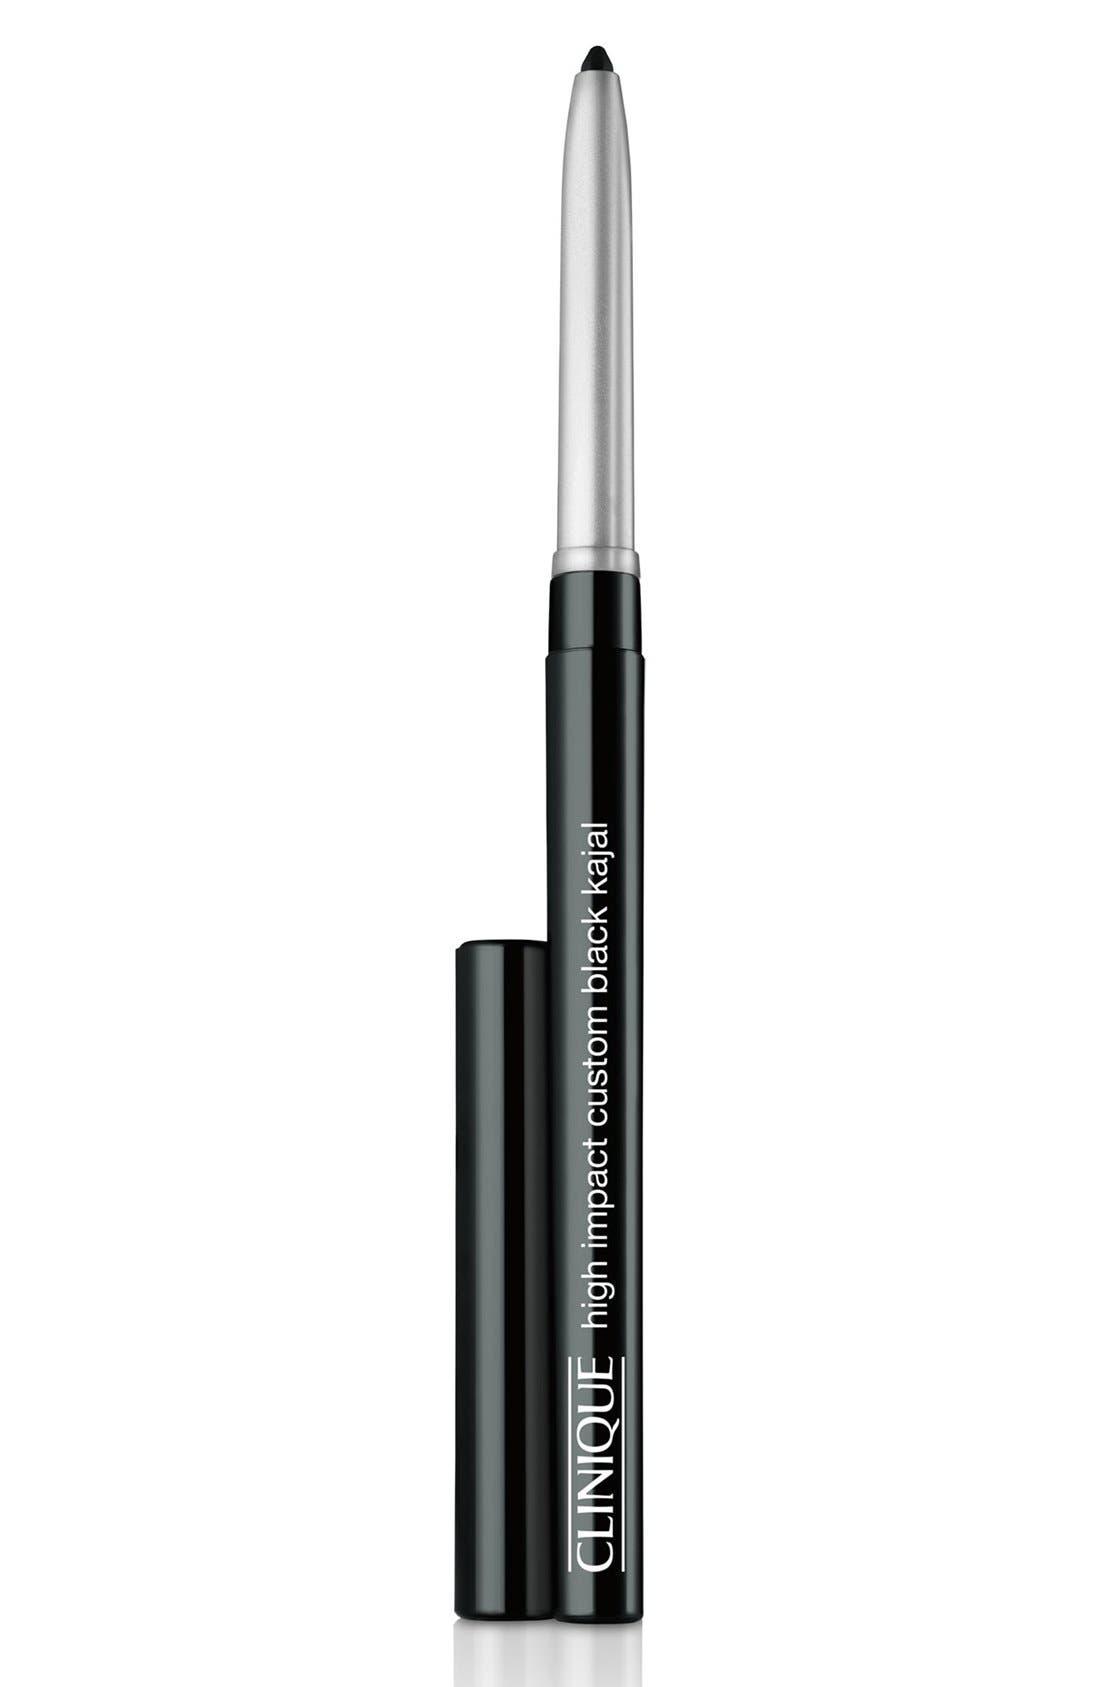 Clinique High Impact Custom Black Kajal Eyeliner Pencil -